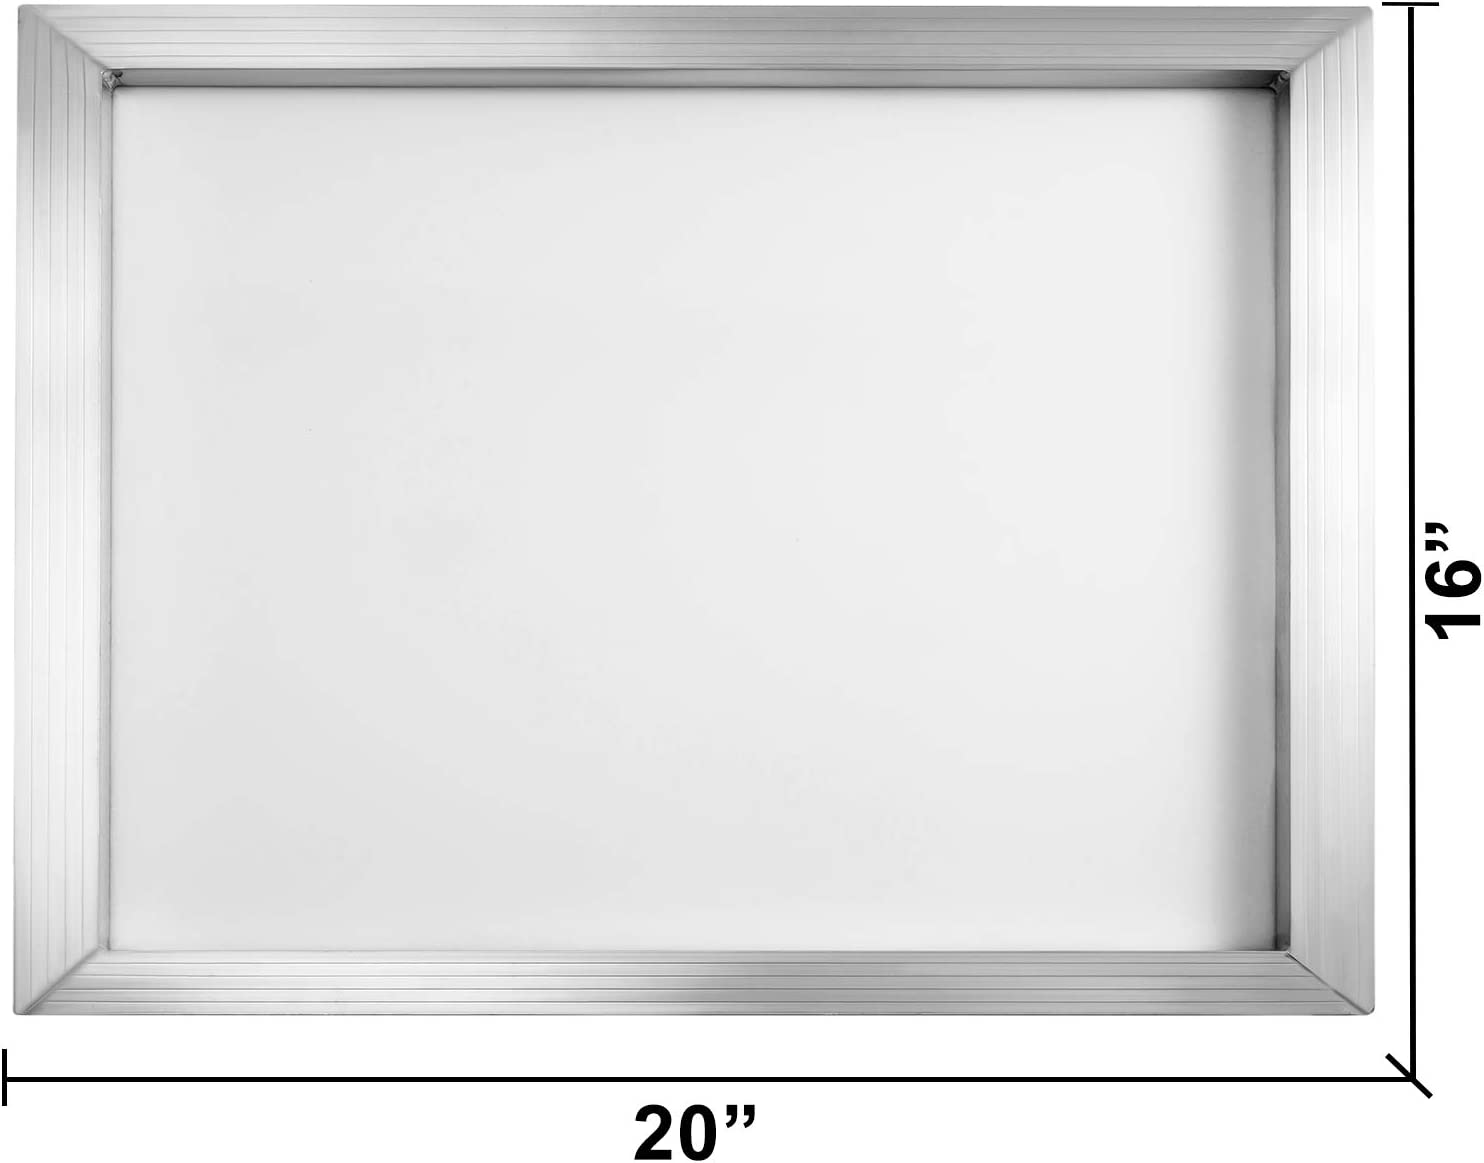 VEVOR Silk Screen Frame 12 Pieces Aluminum Silk Screen Frame 8x10 Inch Silk Screen Printing Frame with White 110 Count Mesh